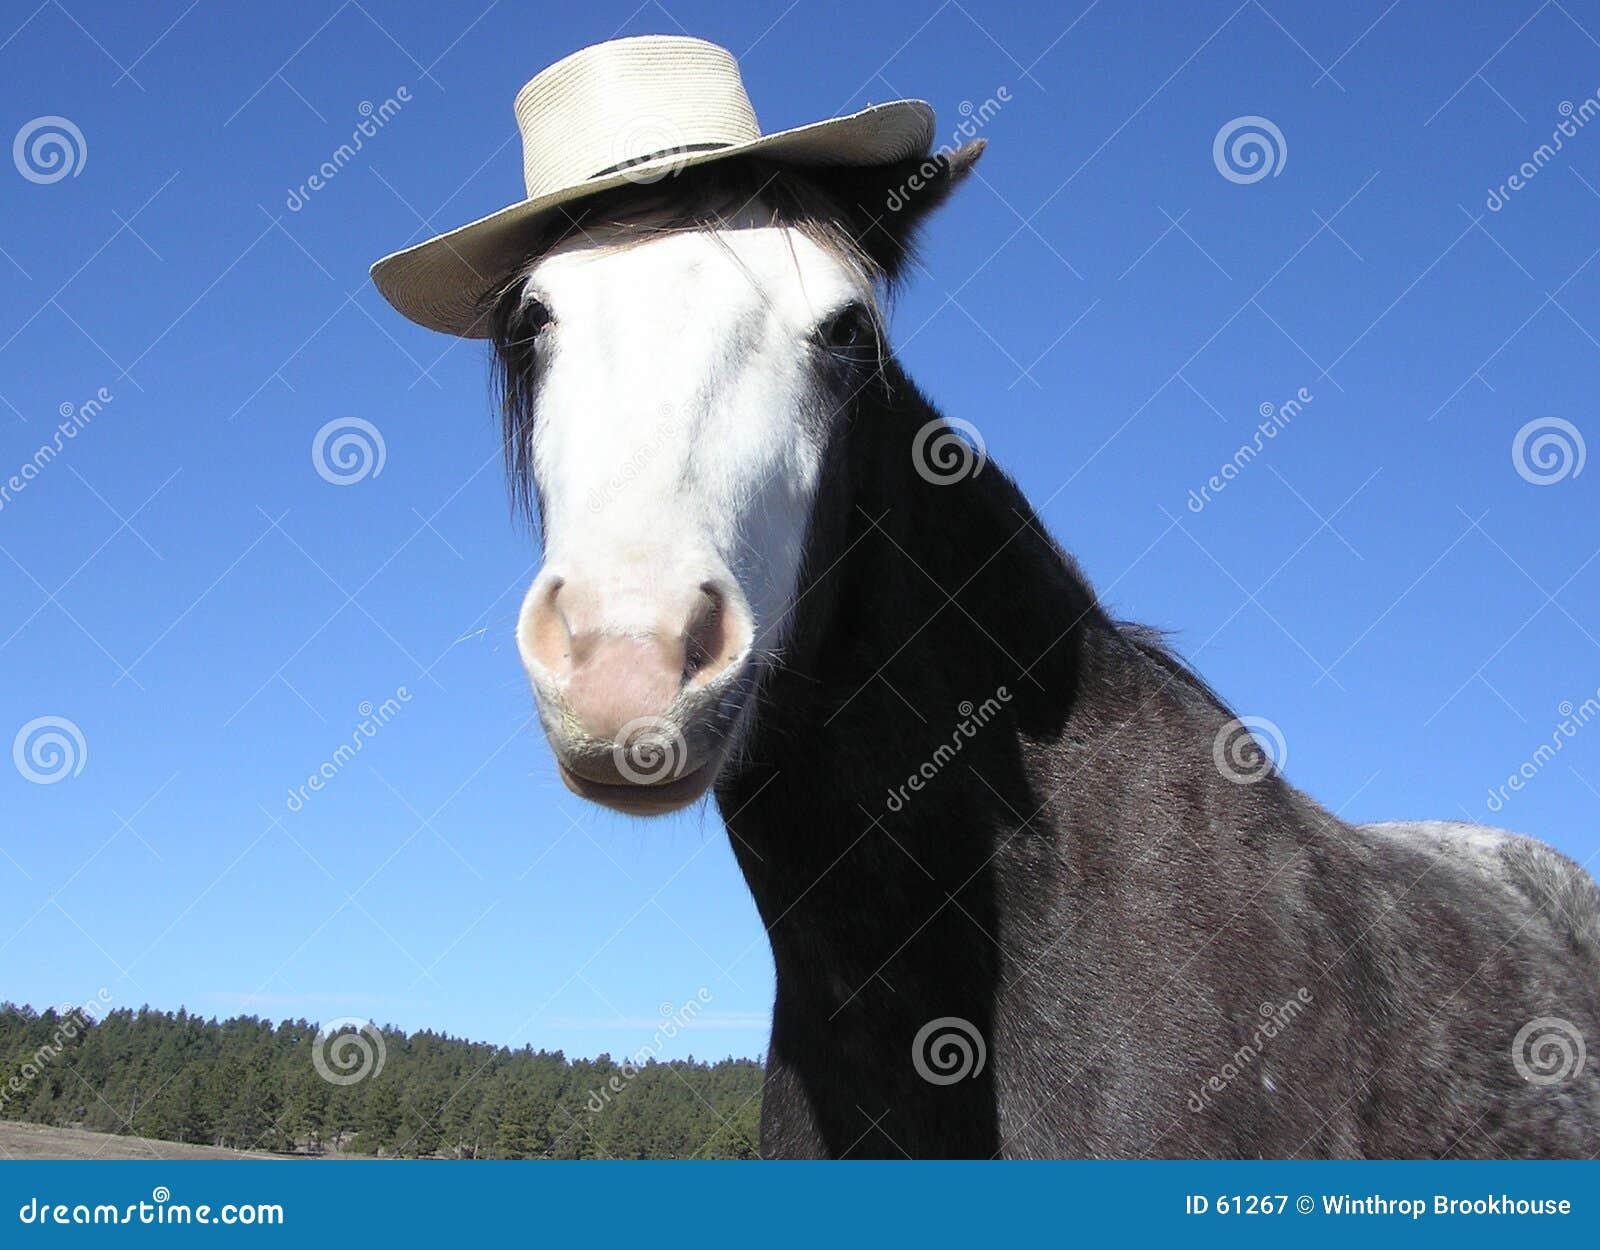 Cavalo com chapéu